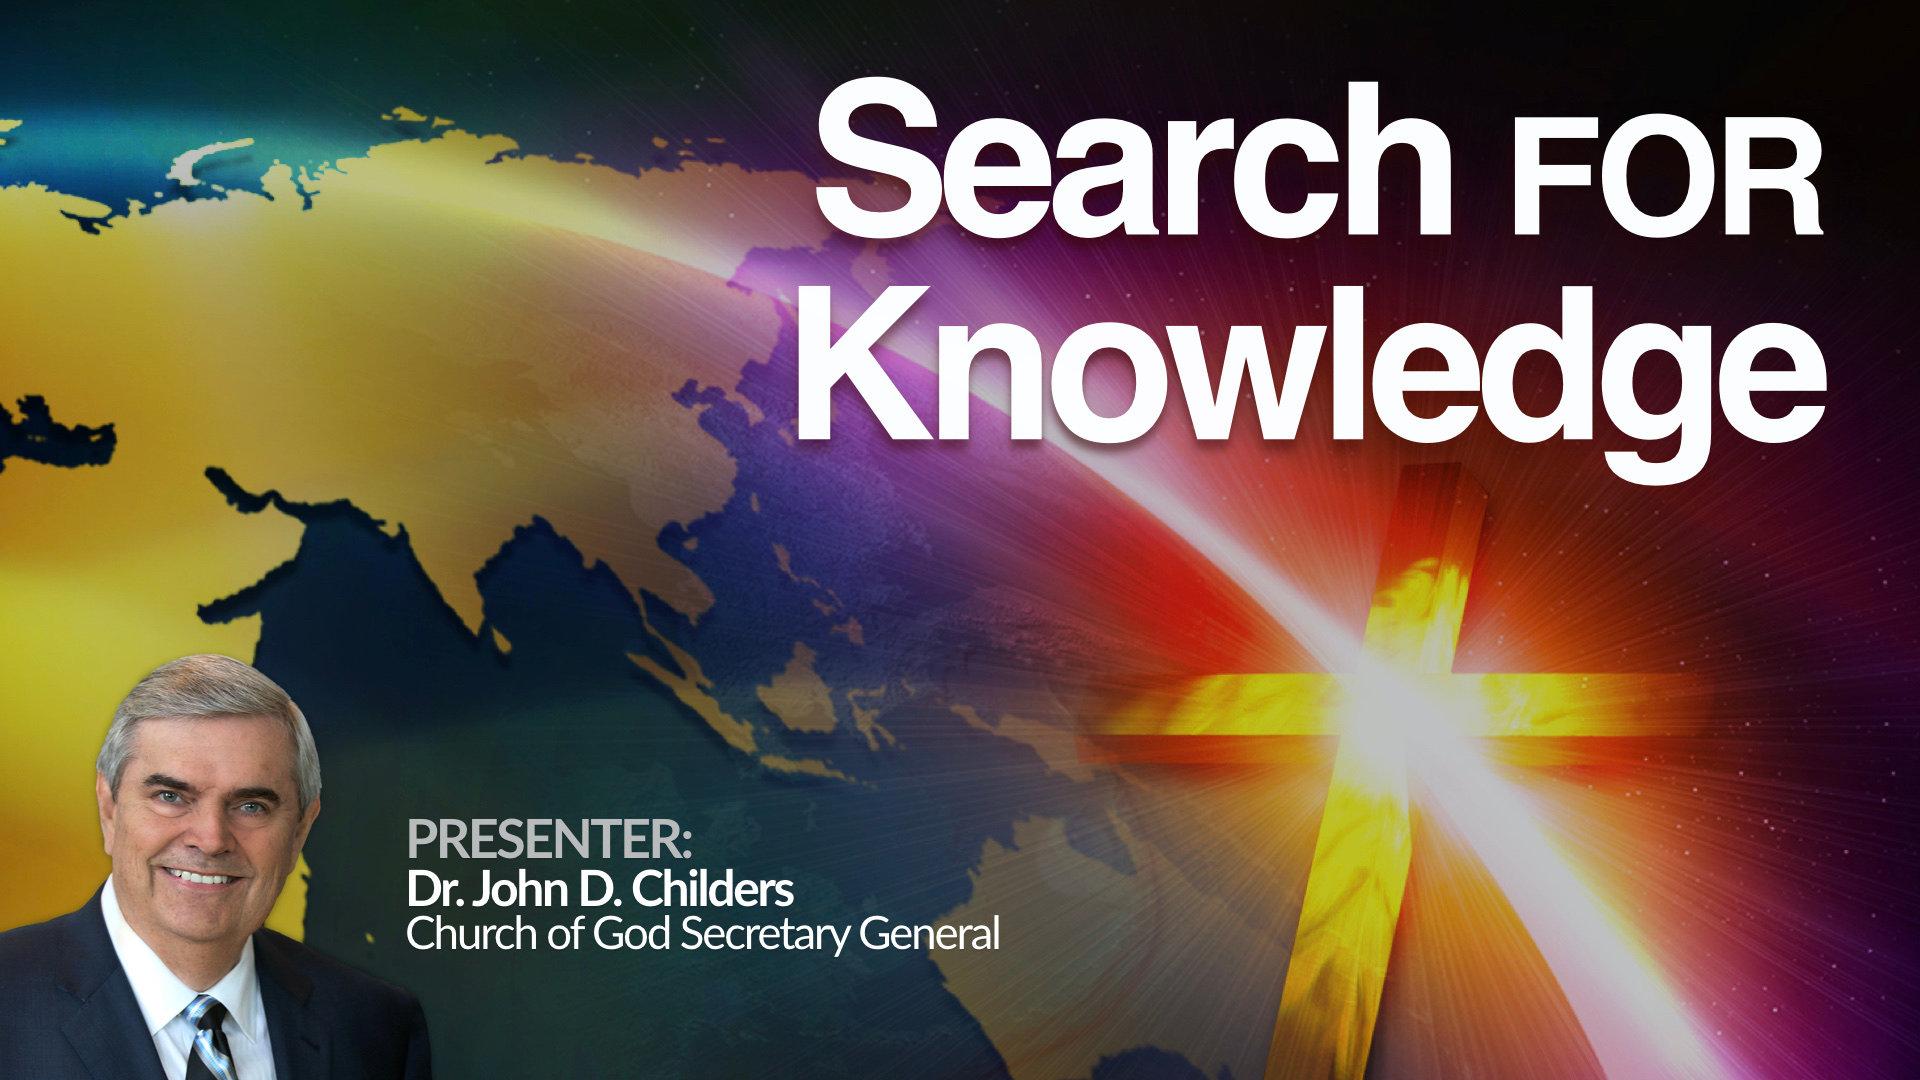 SearchforKnowledge.013-rdx.jpg